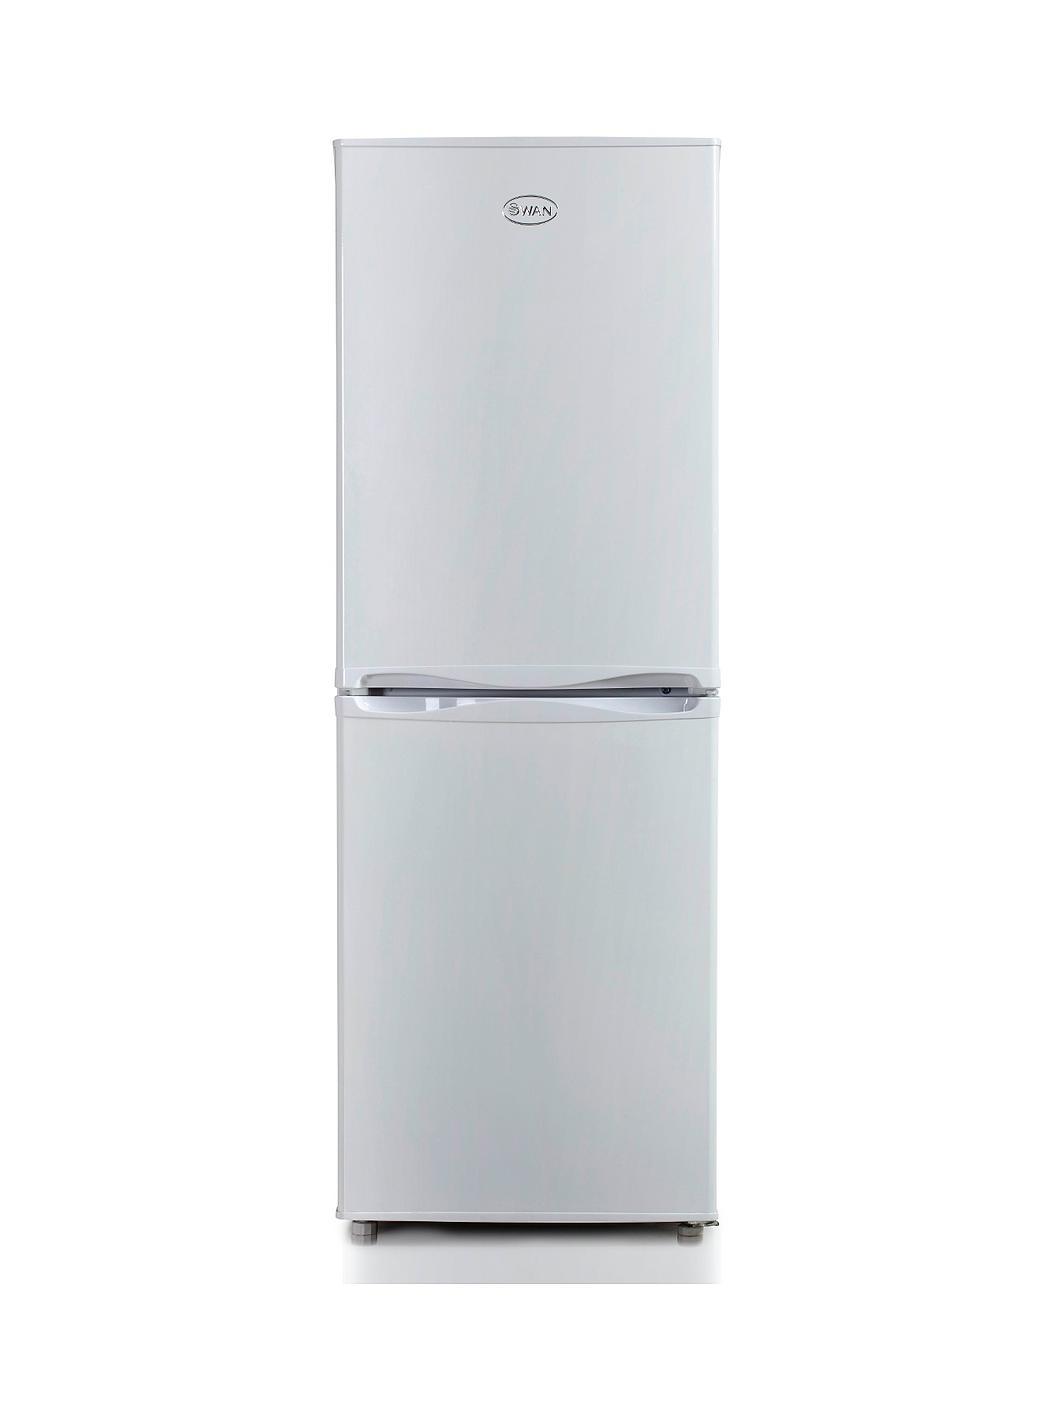 swan sr5290w 50cm fridge freezer white. Black Bedroom Furniture Sets. Home Design Ideas